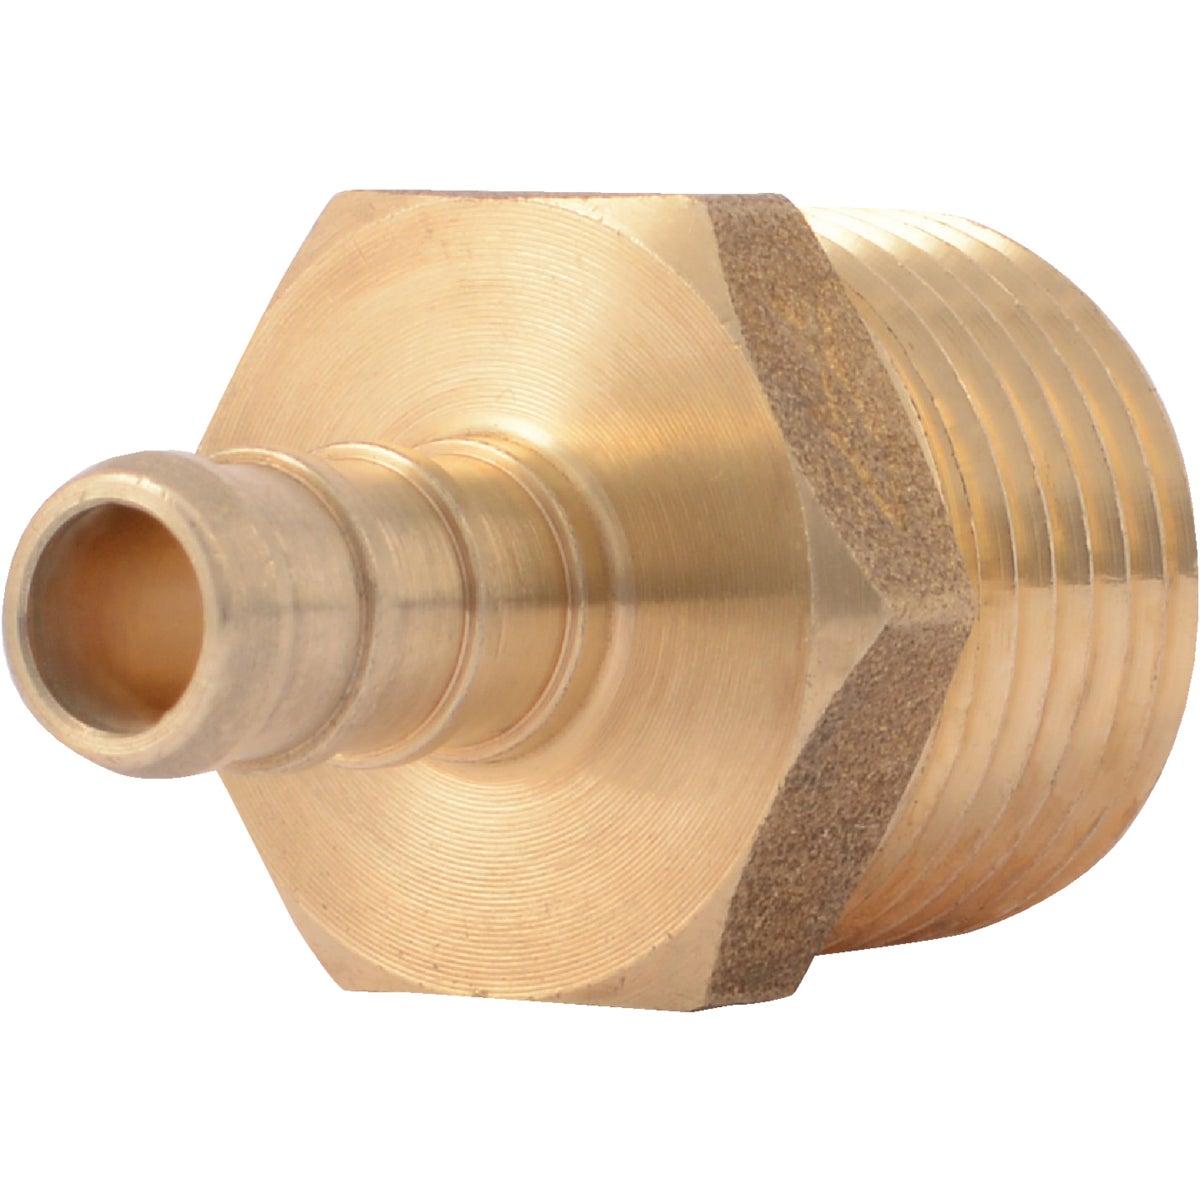 3/8CFX1/2MPT BRS ADAPTER - LF P-511 by Watts Regulator Co